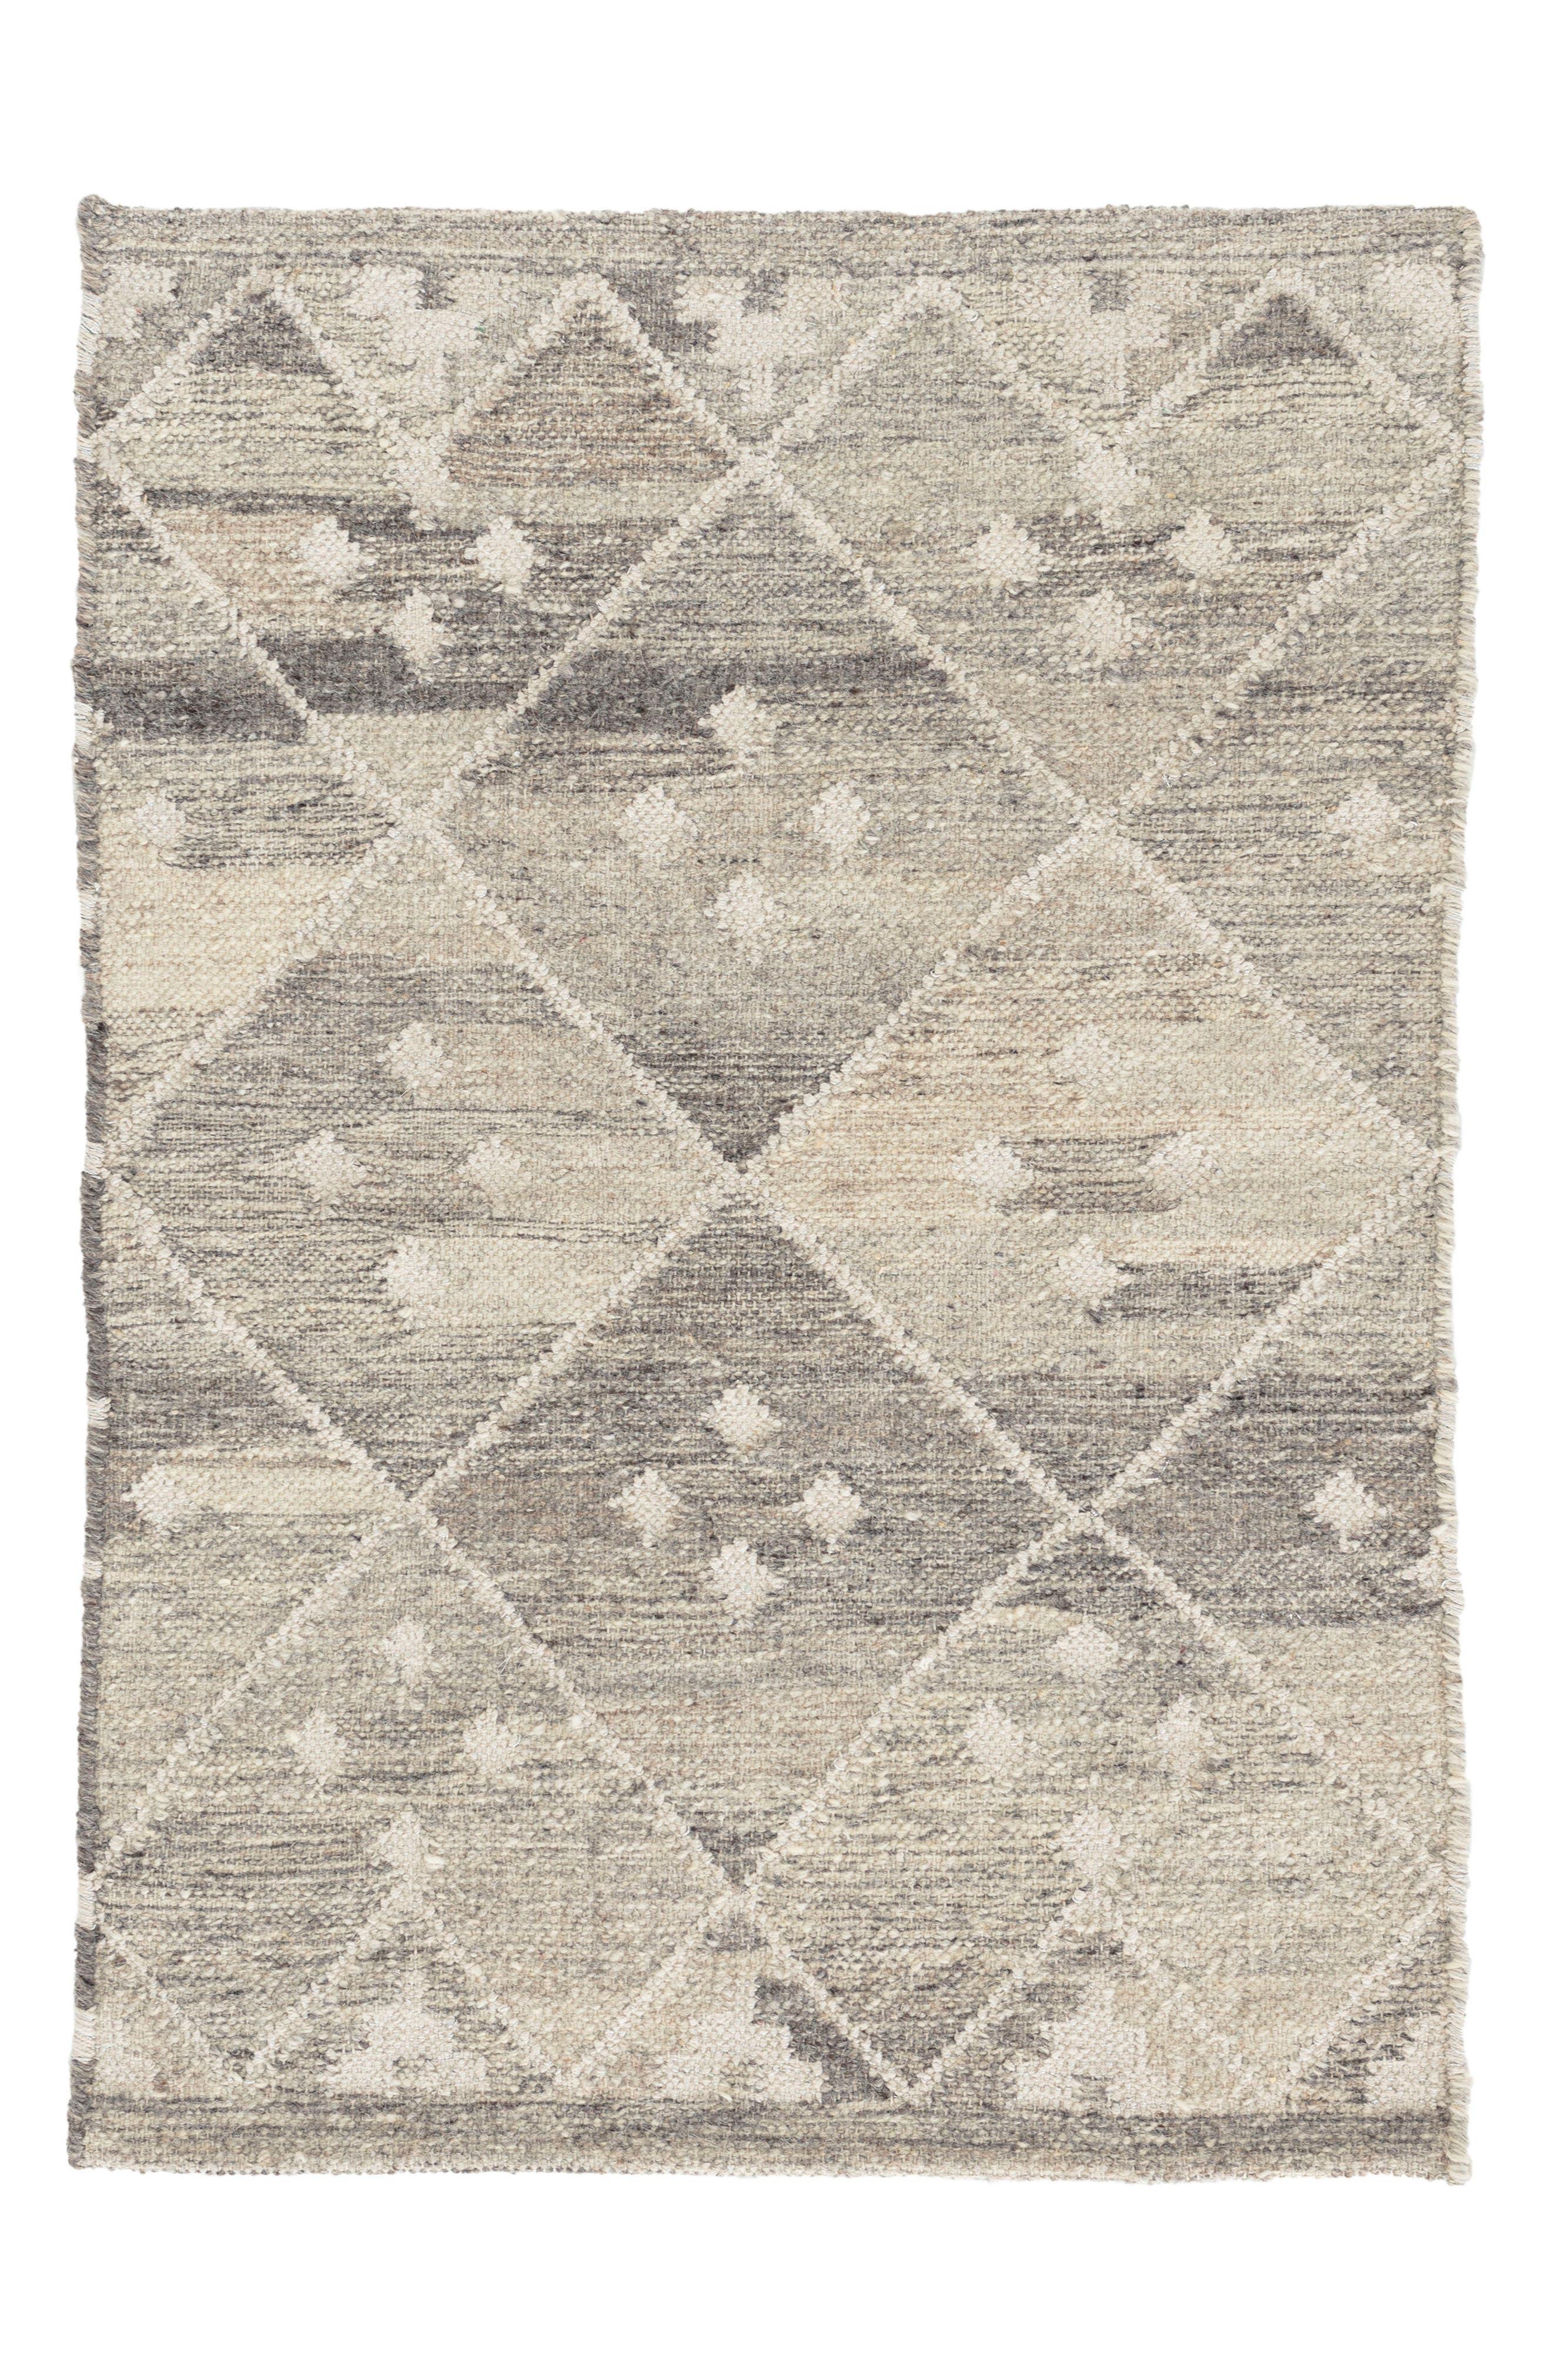 Dash Albert Kota Woven Wool Cotton Rug Nordstrom